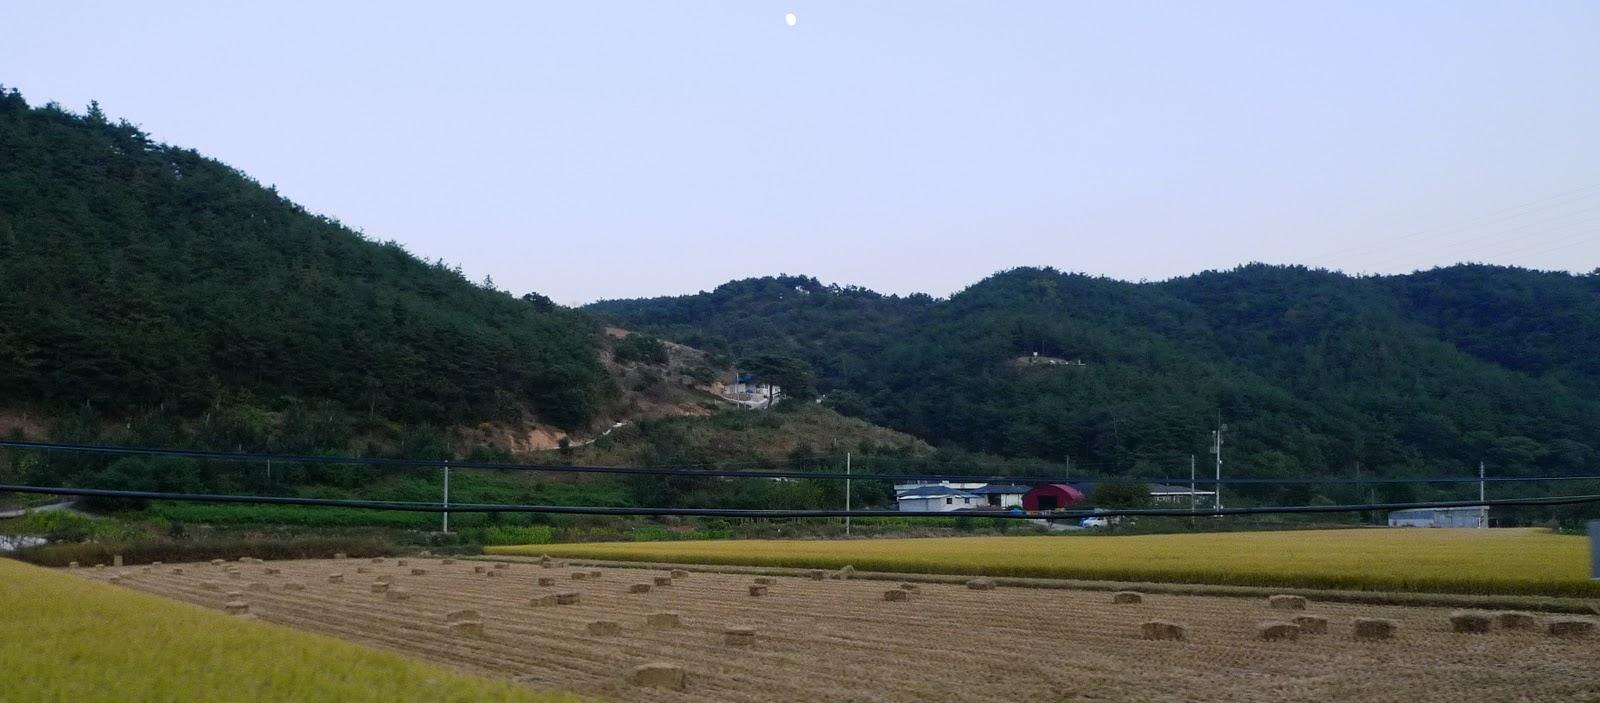 Sancheong-gun South Korea  city photos gallery : ... ベイルハウス Straw Bale Homes in Sancheong, South Korea